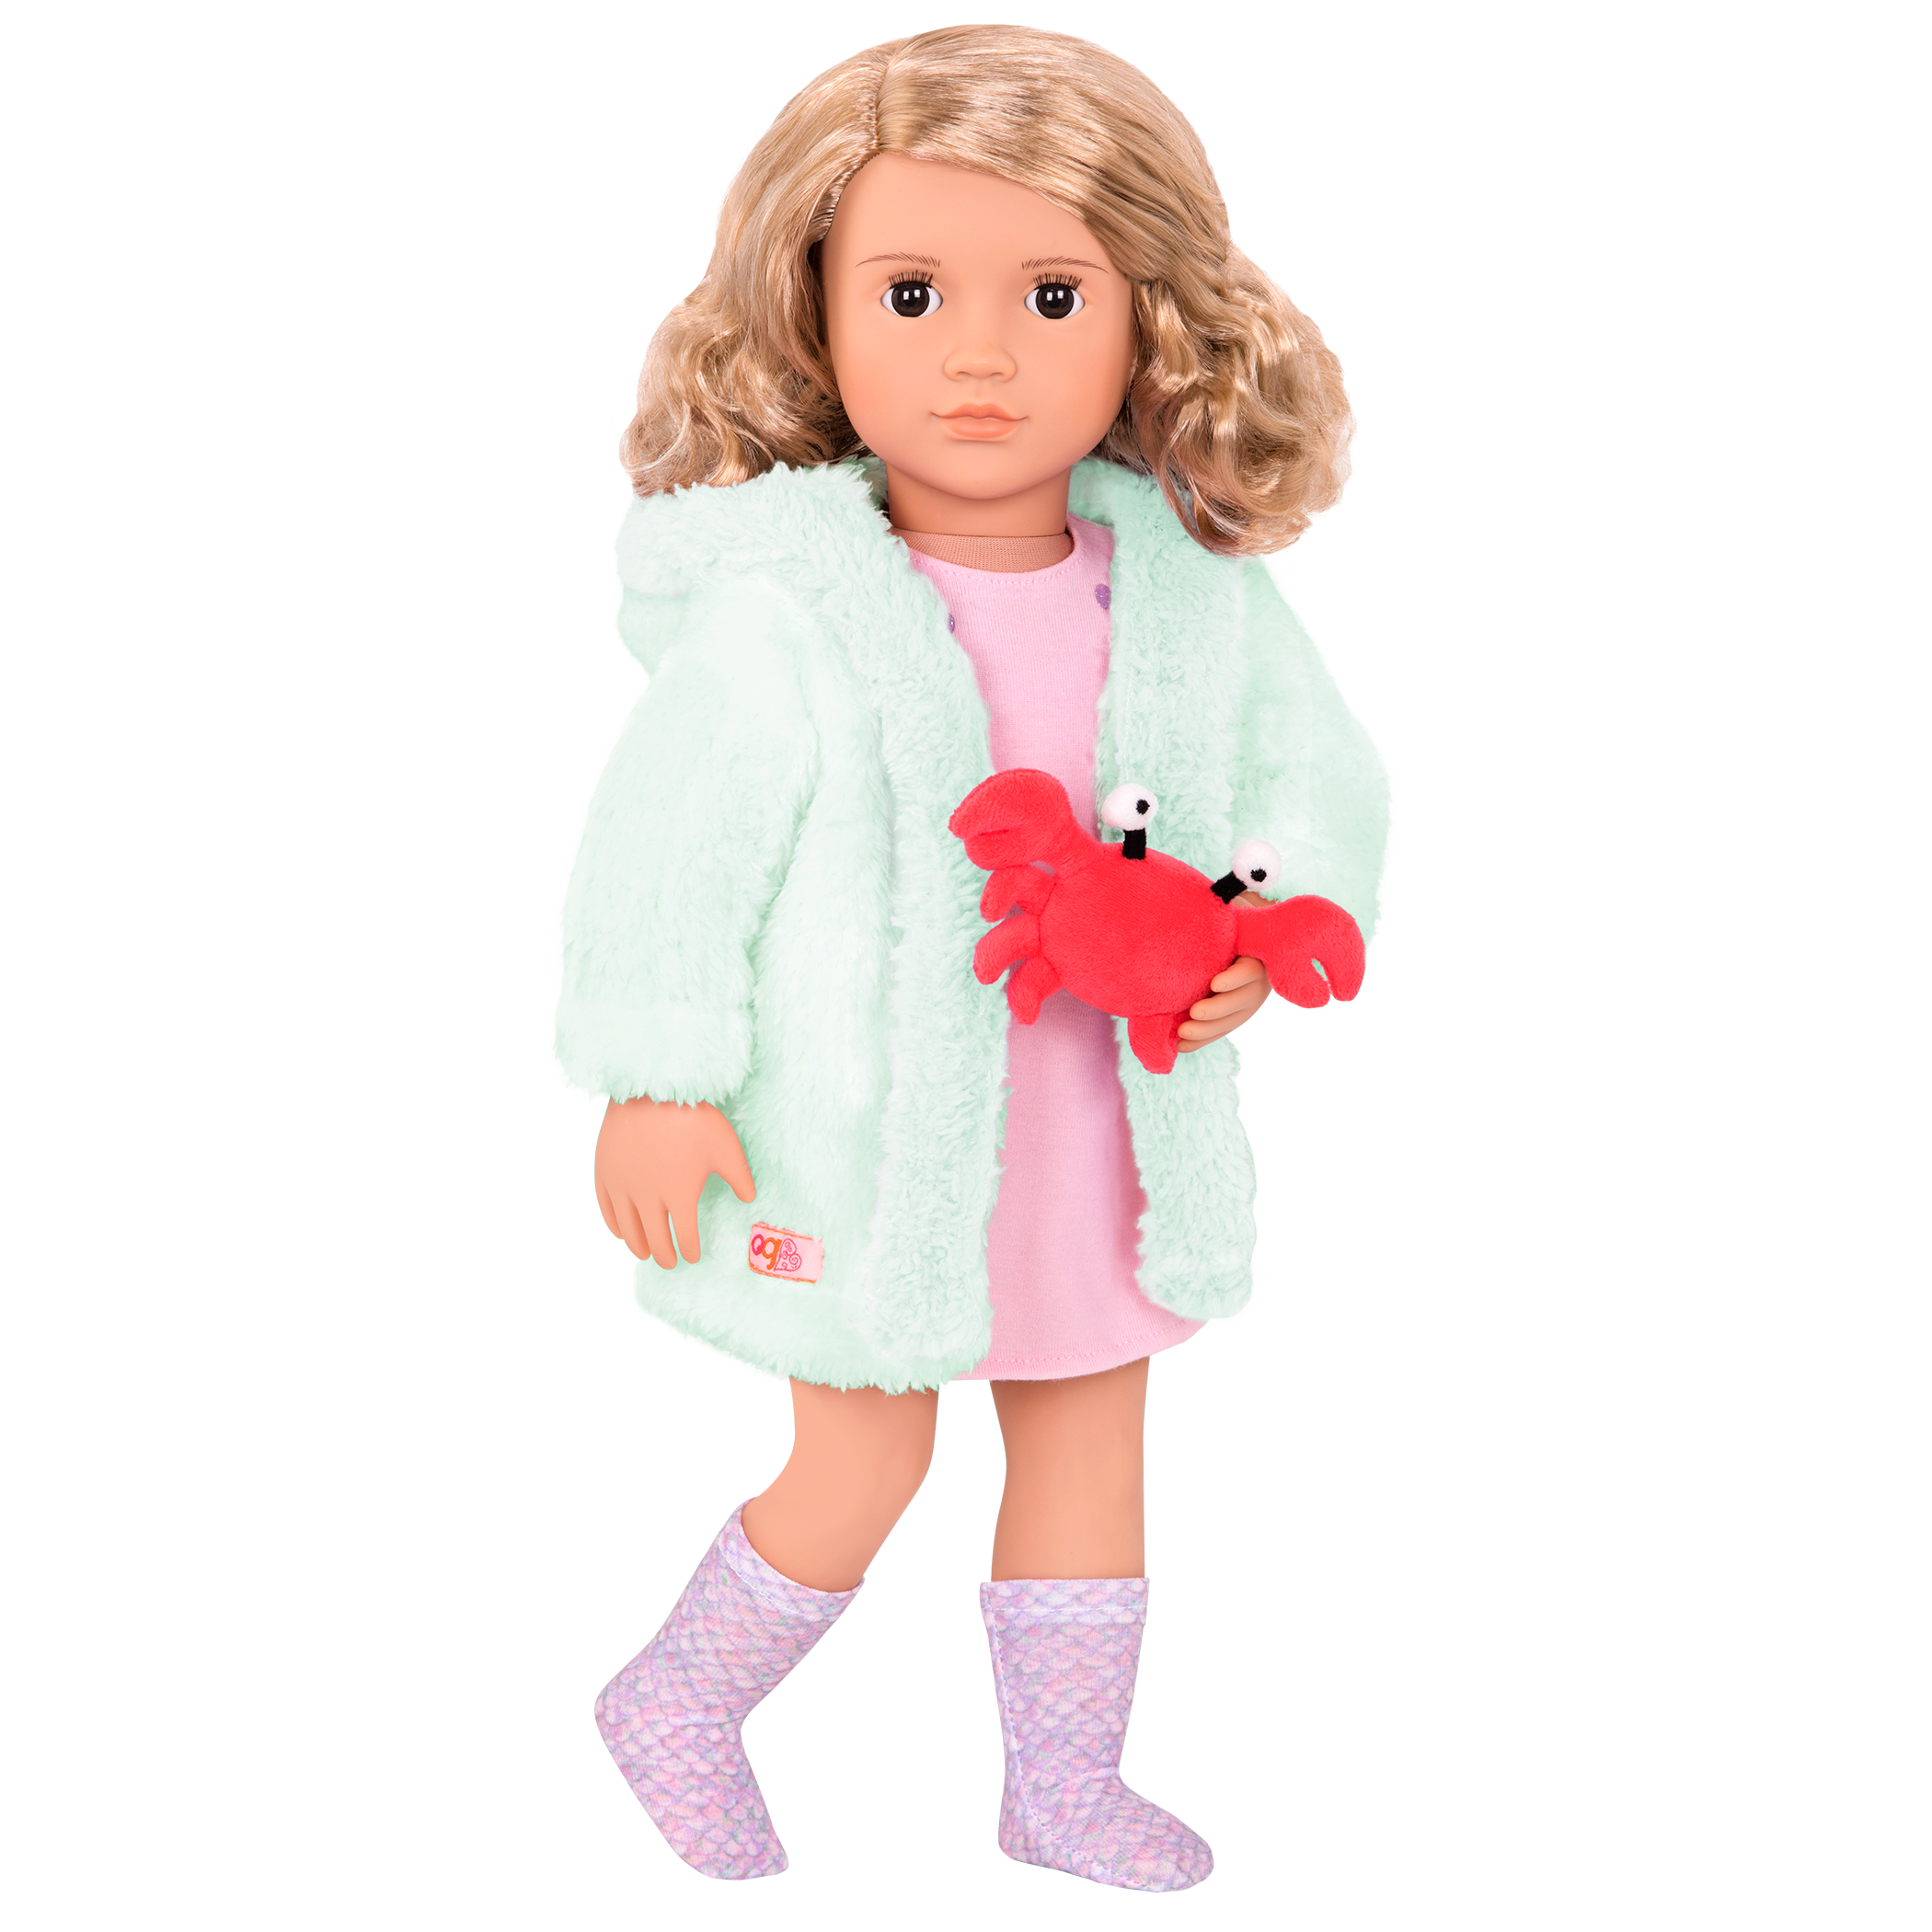 Noelle wearing Seaside Dreaming outfit